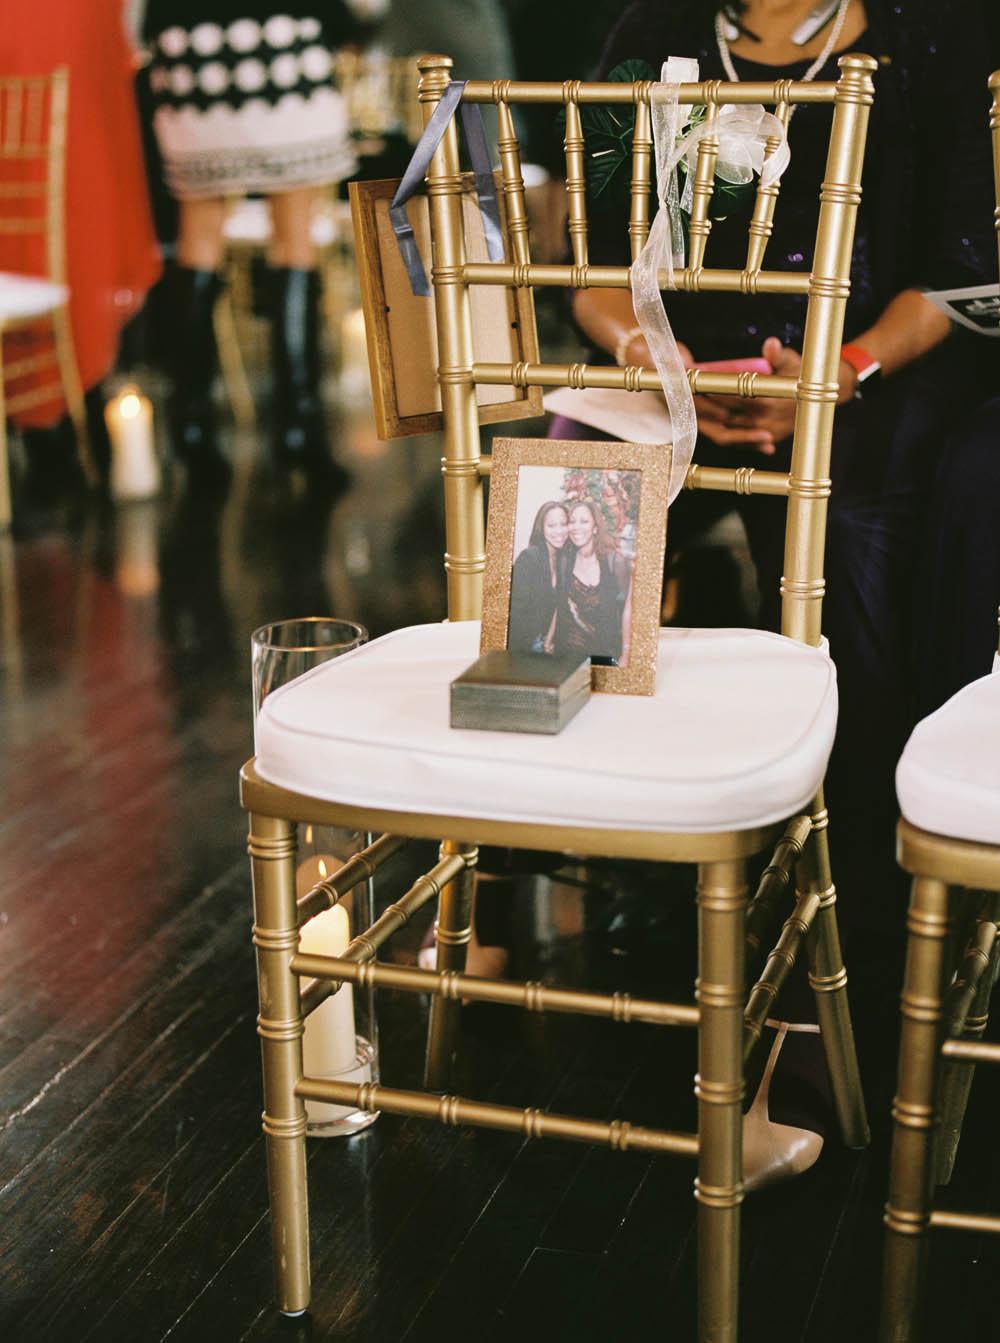 nashville ruby film documentary wedding photographer heartfelt real moments african american wedding munalachi bride ©2016abigailbobophotography-16.jpg